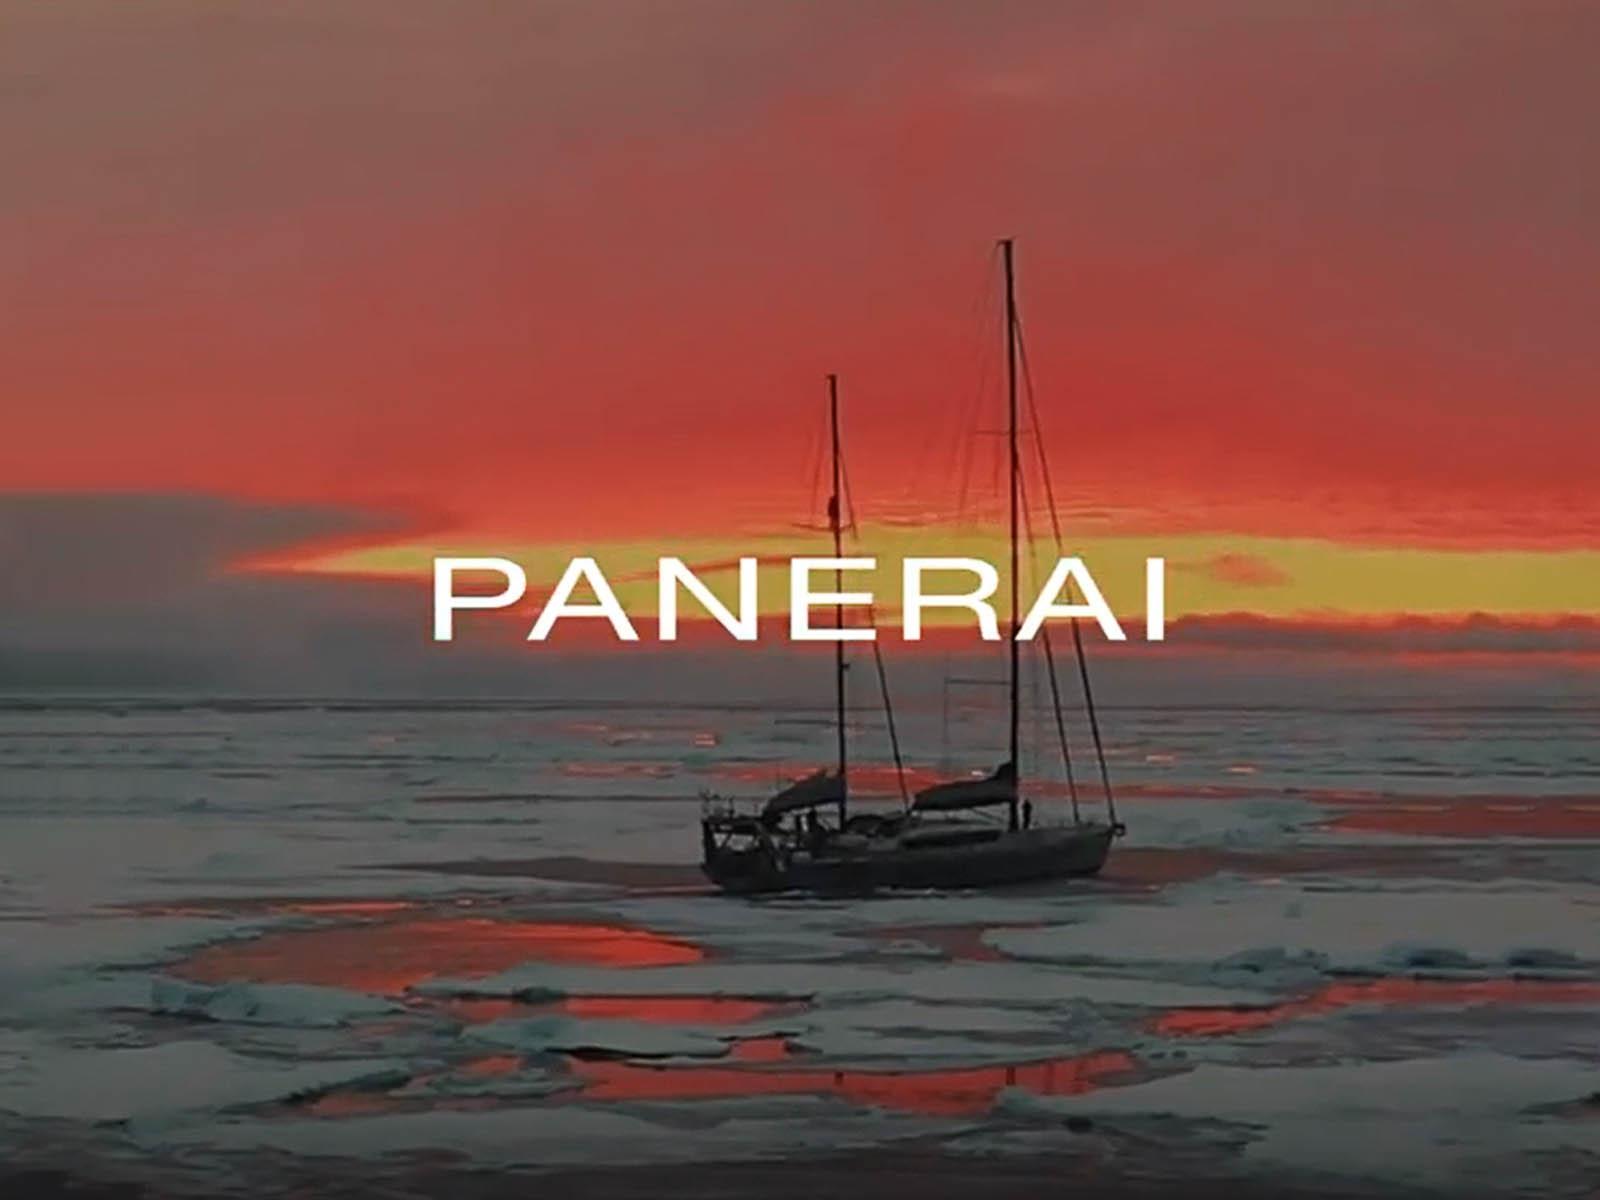 panerai-ownyourtime-interactive-content-platform-3.jpg